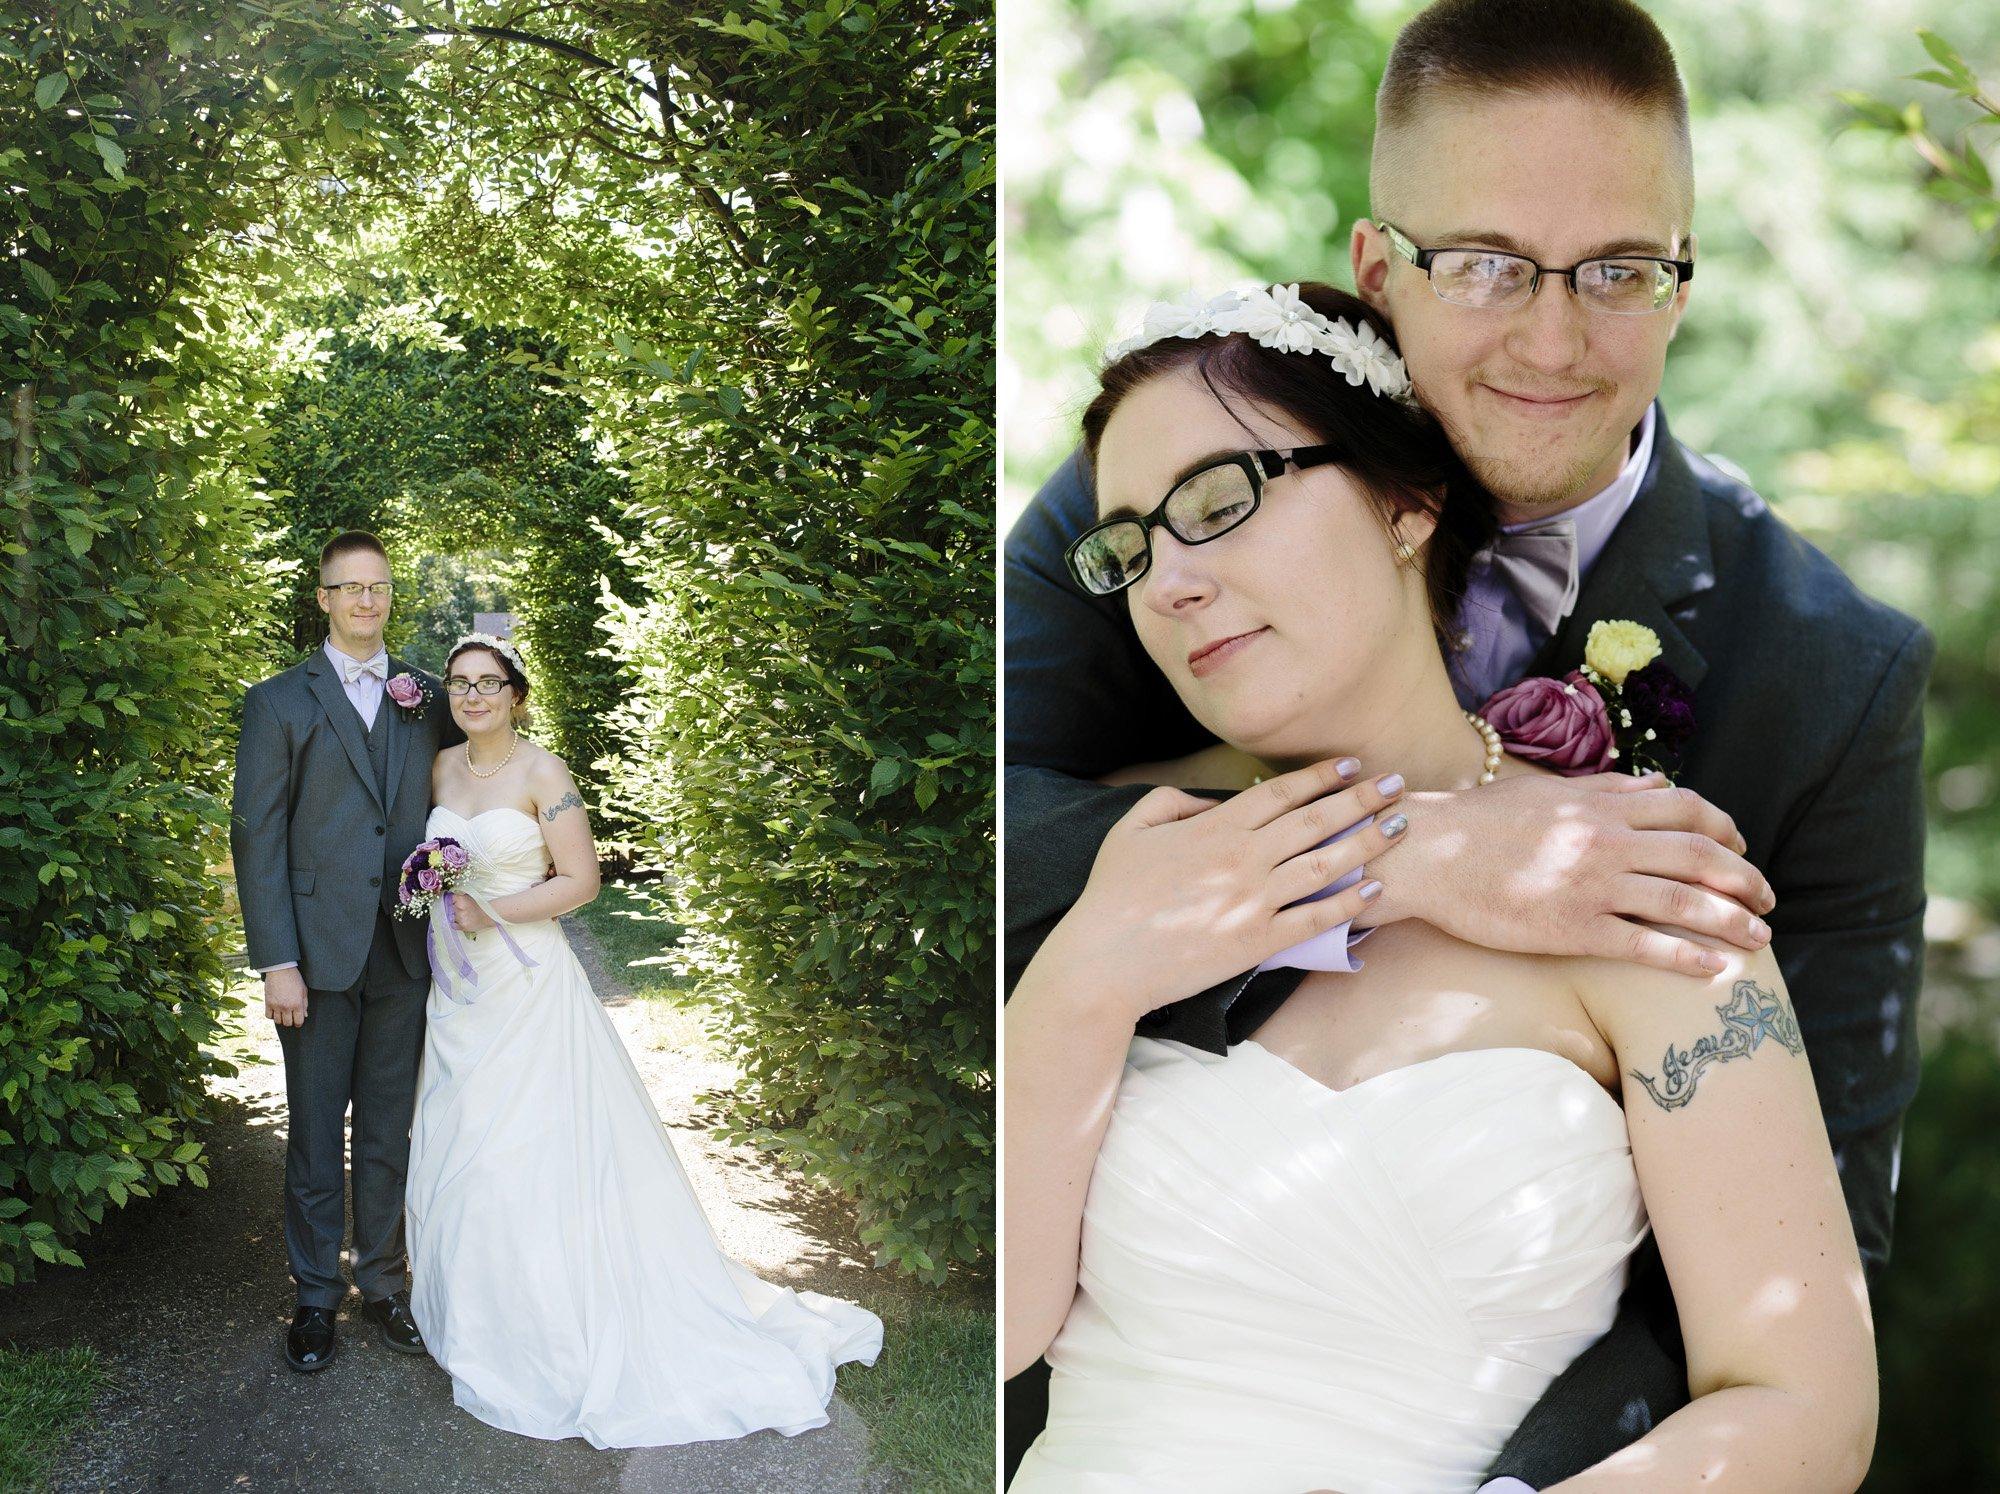 Manito Park Spokane Wedding // Emily Wenzel Photography